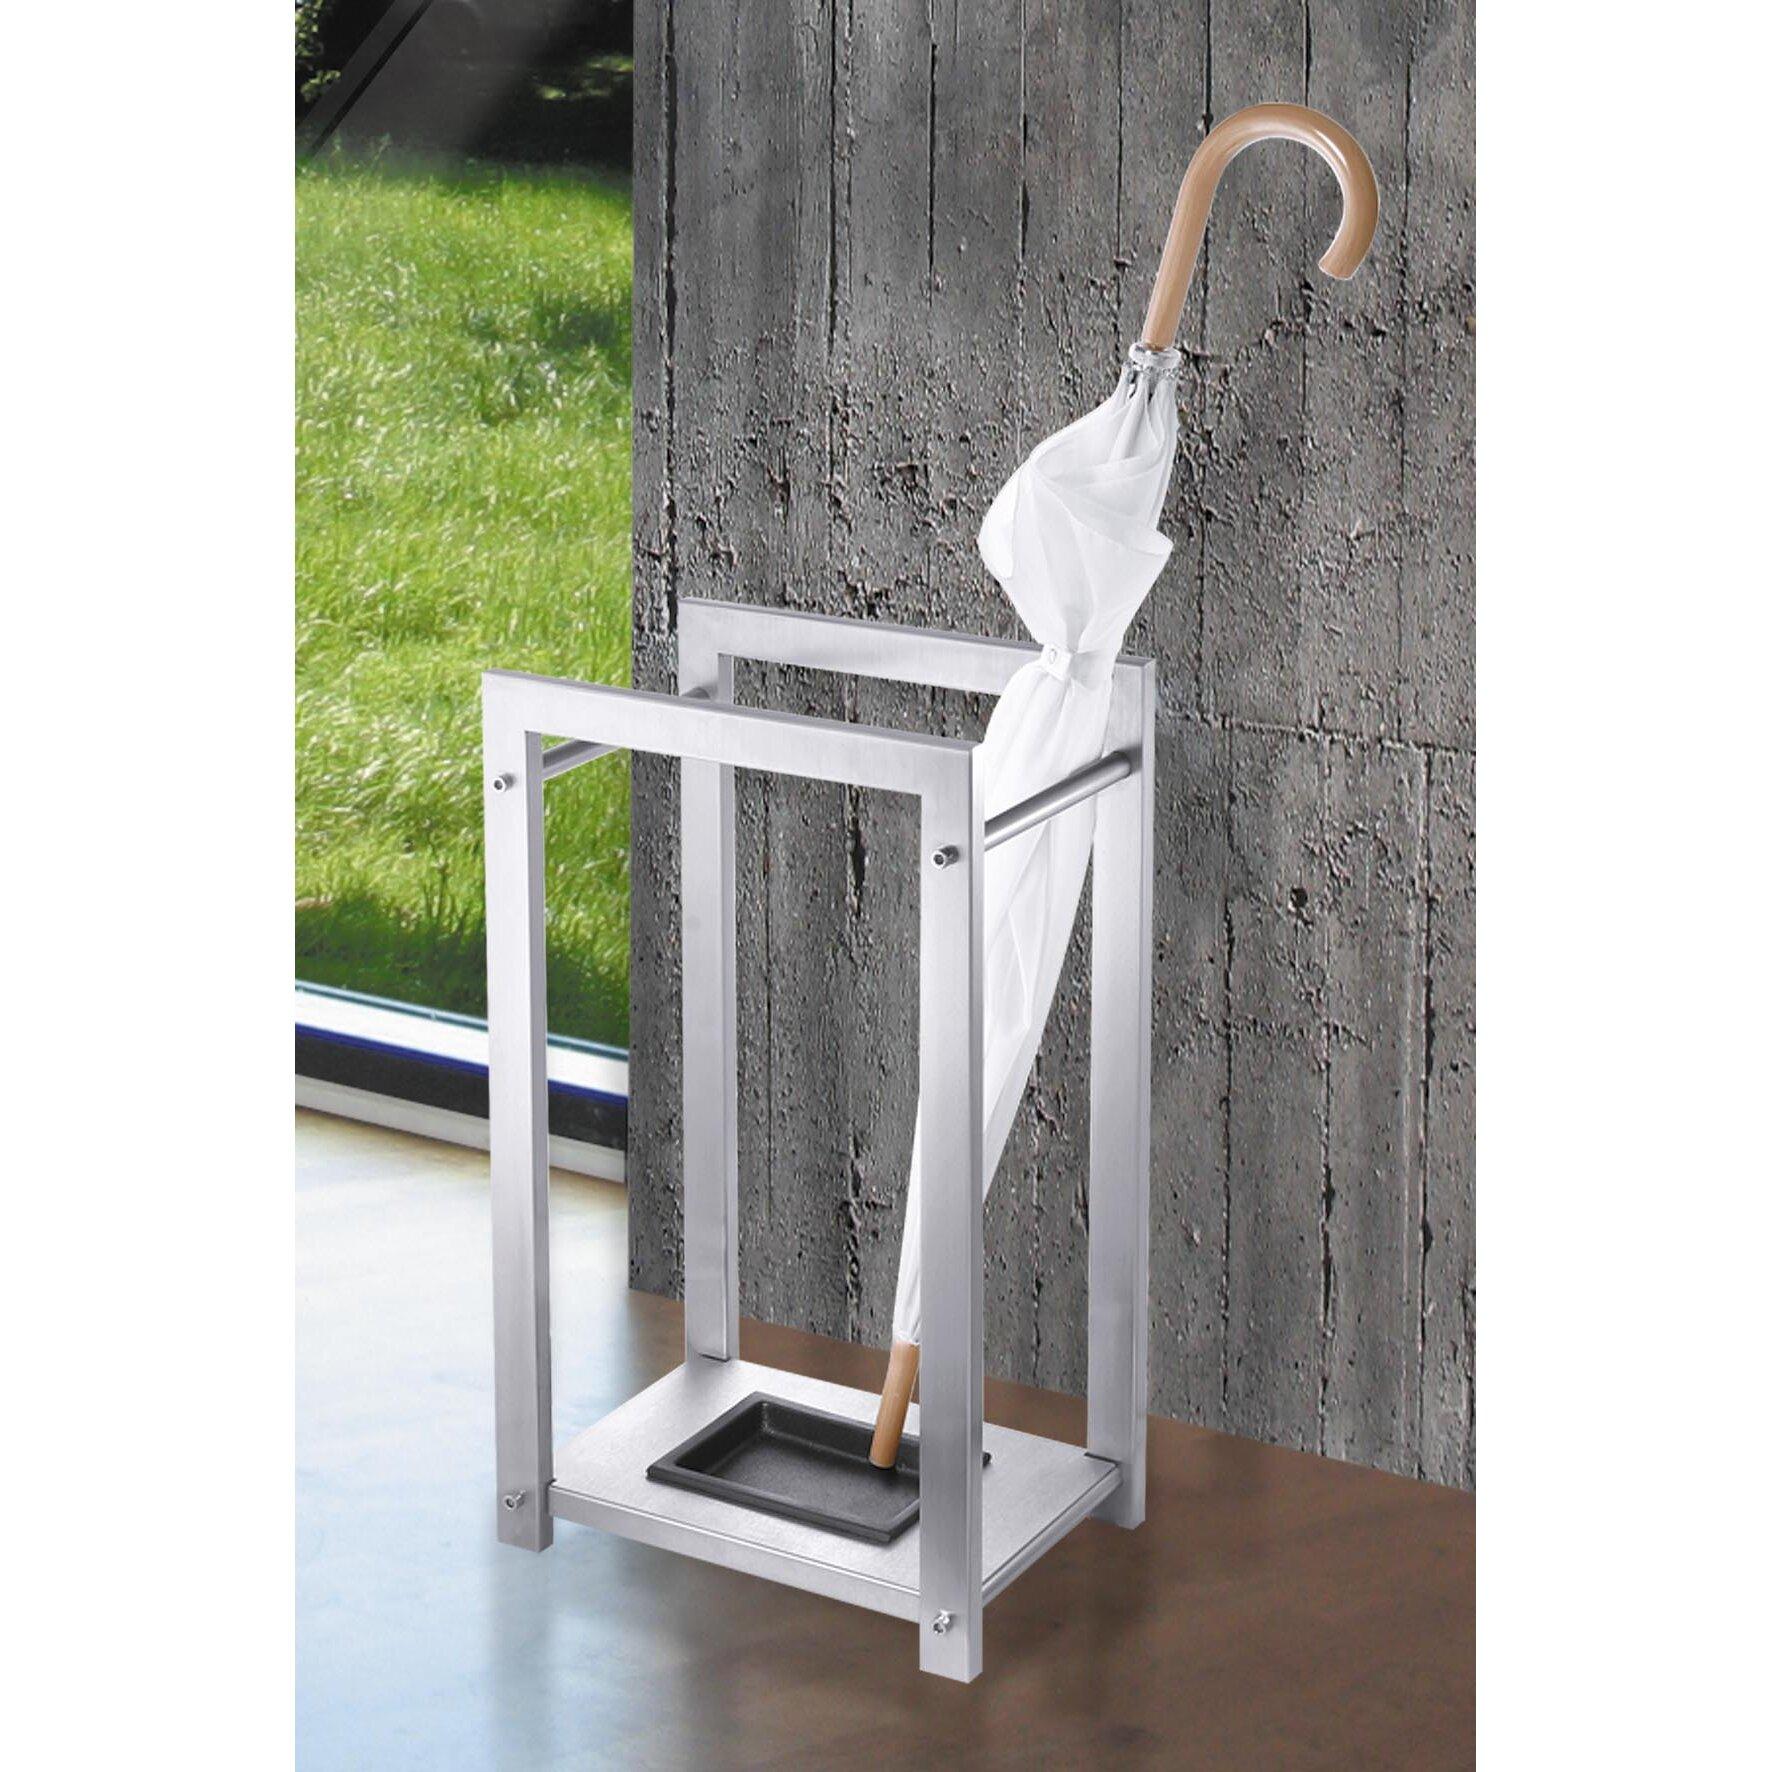 Umbrella Stand Wayfair: ZACK Atacio Umbrella Stand & Reviews